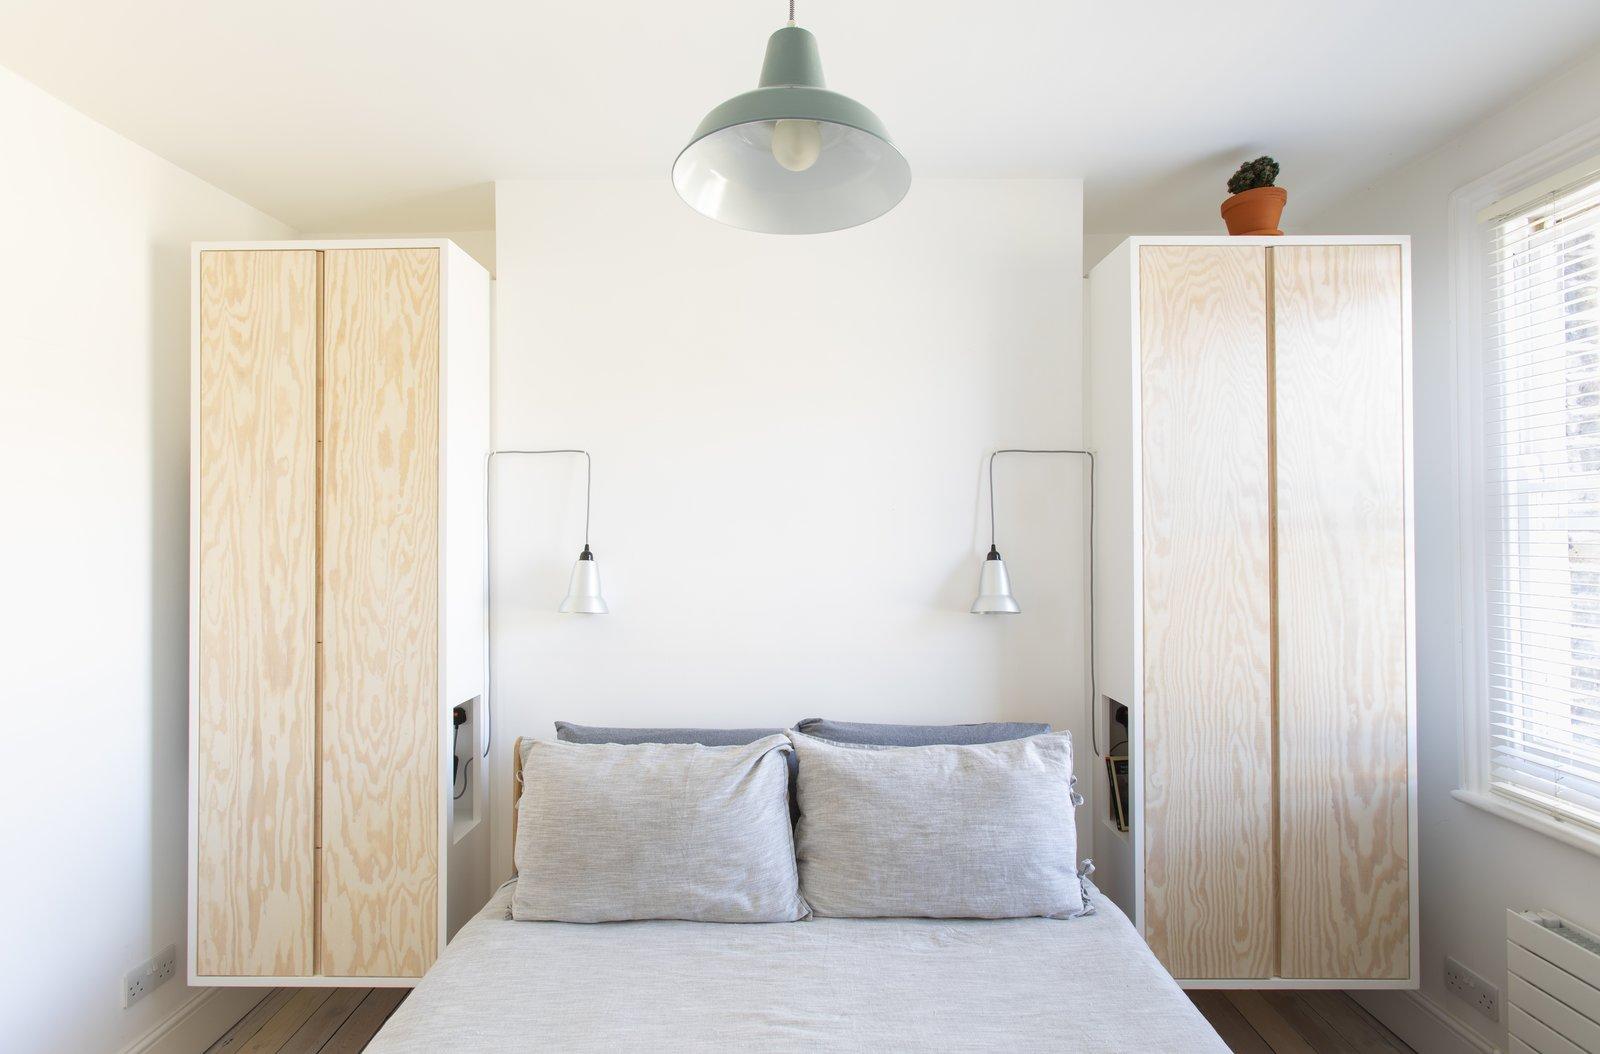 Elephant & Castle Maisonette Refurbishement by Atelier Baulier Bedroom